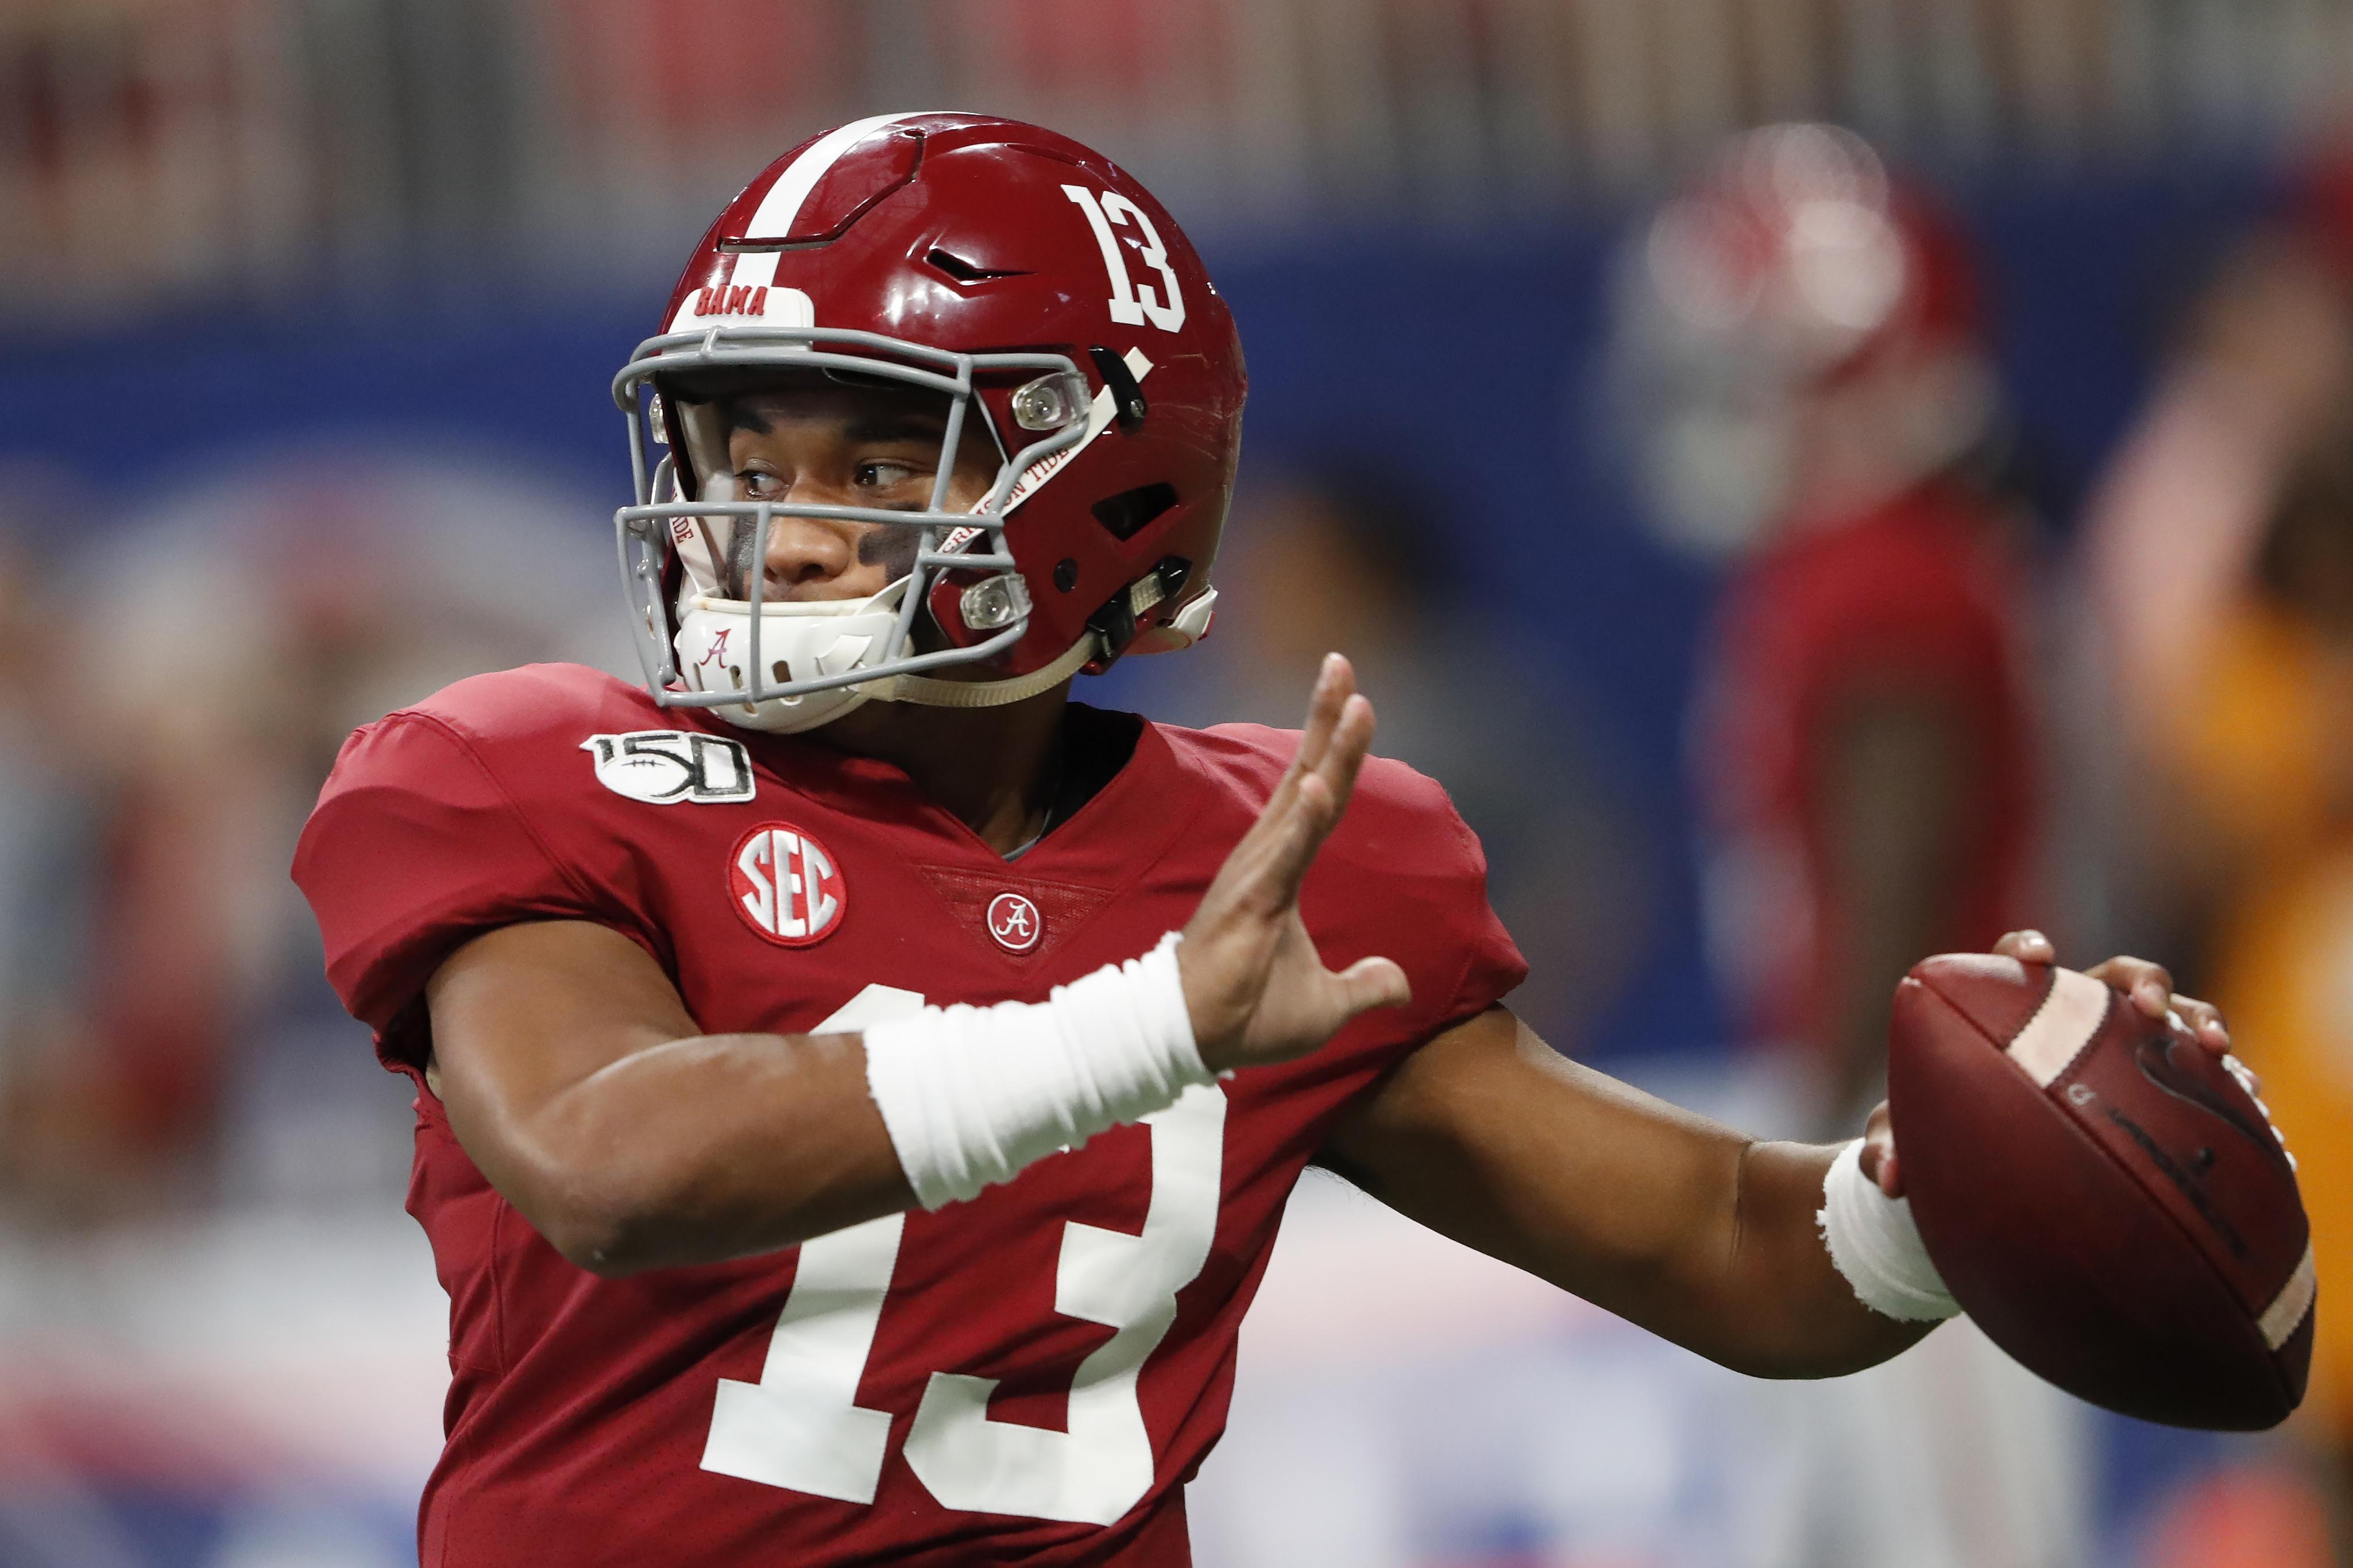 online store 17ee8 5b8ee Top-25 football roundup: Tua Tagovailoa helps No. 2 Alabama ...